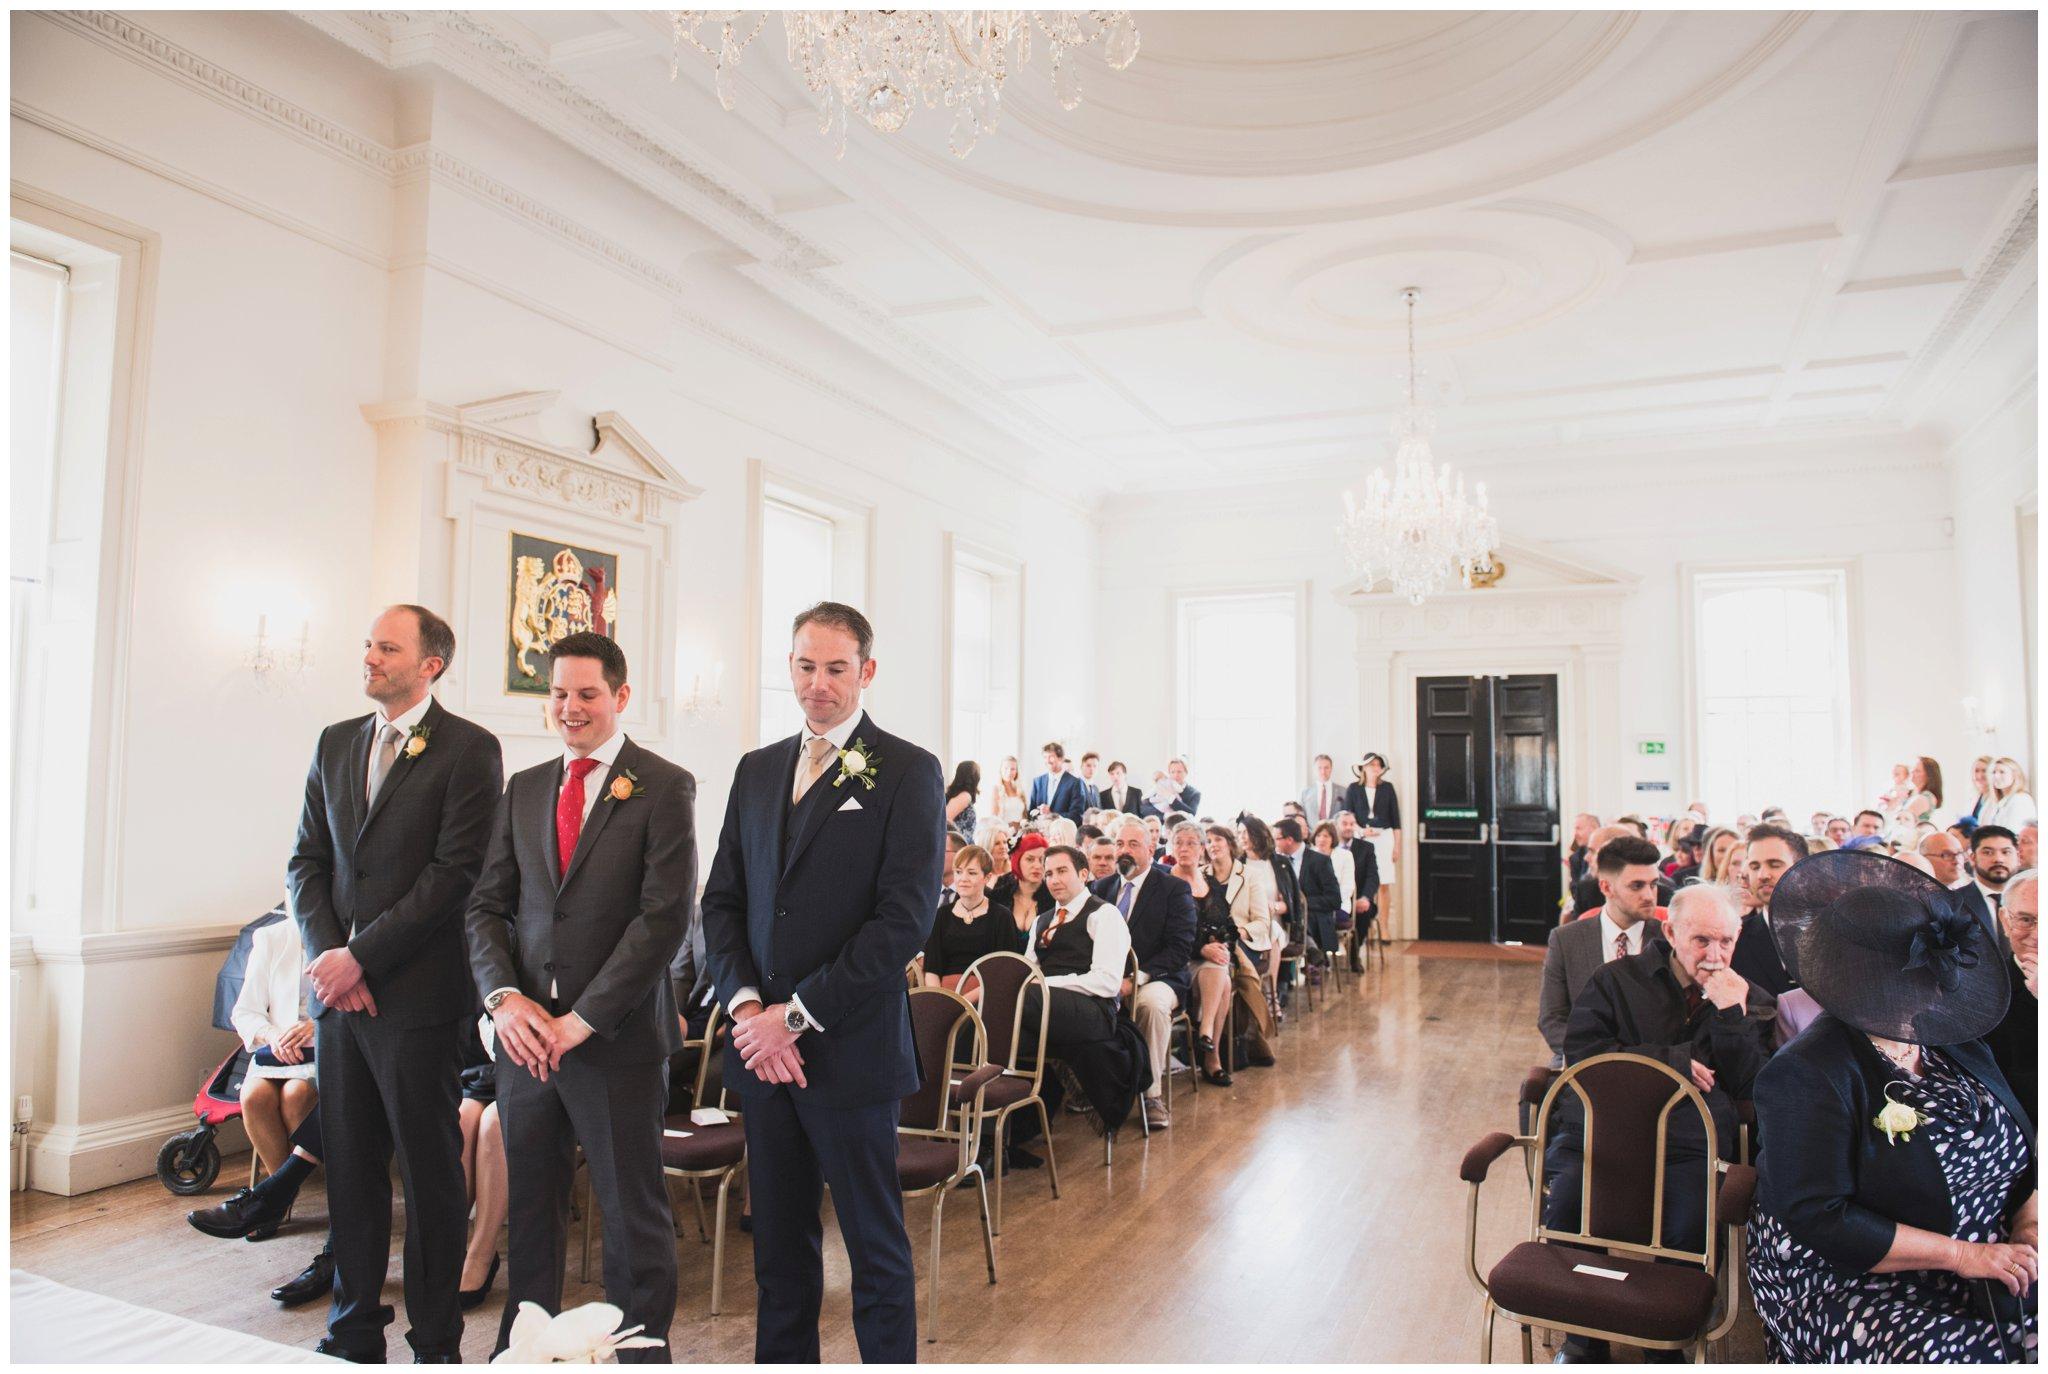 poole townhall wedding ceremony room groom waiting